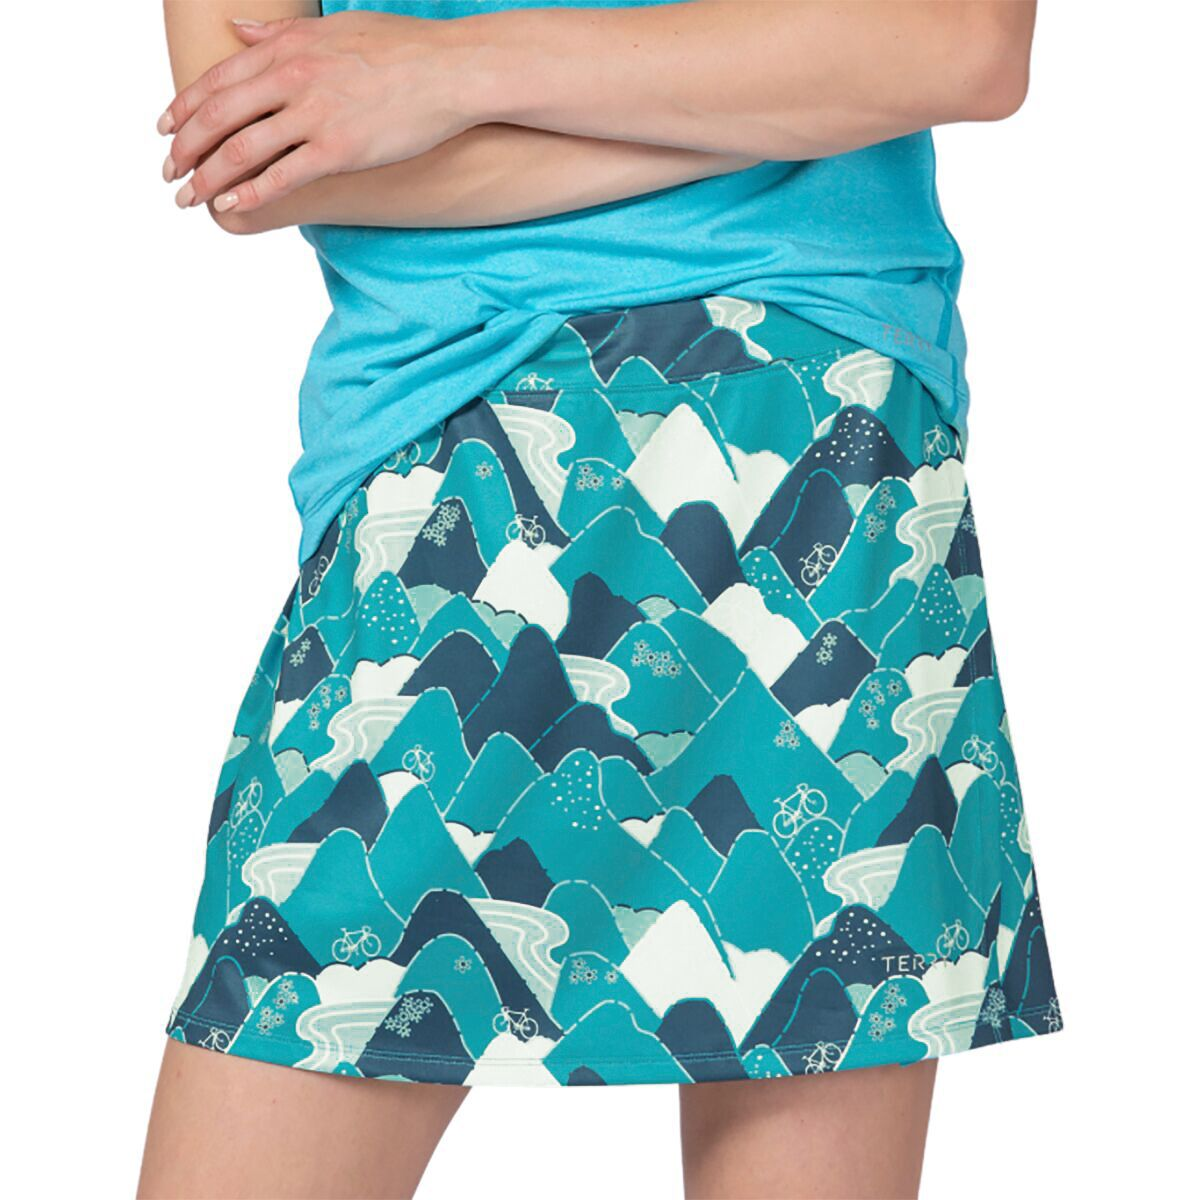 Mixie Skirt - Women